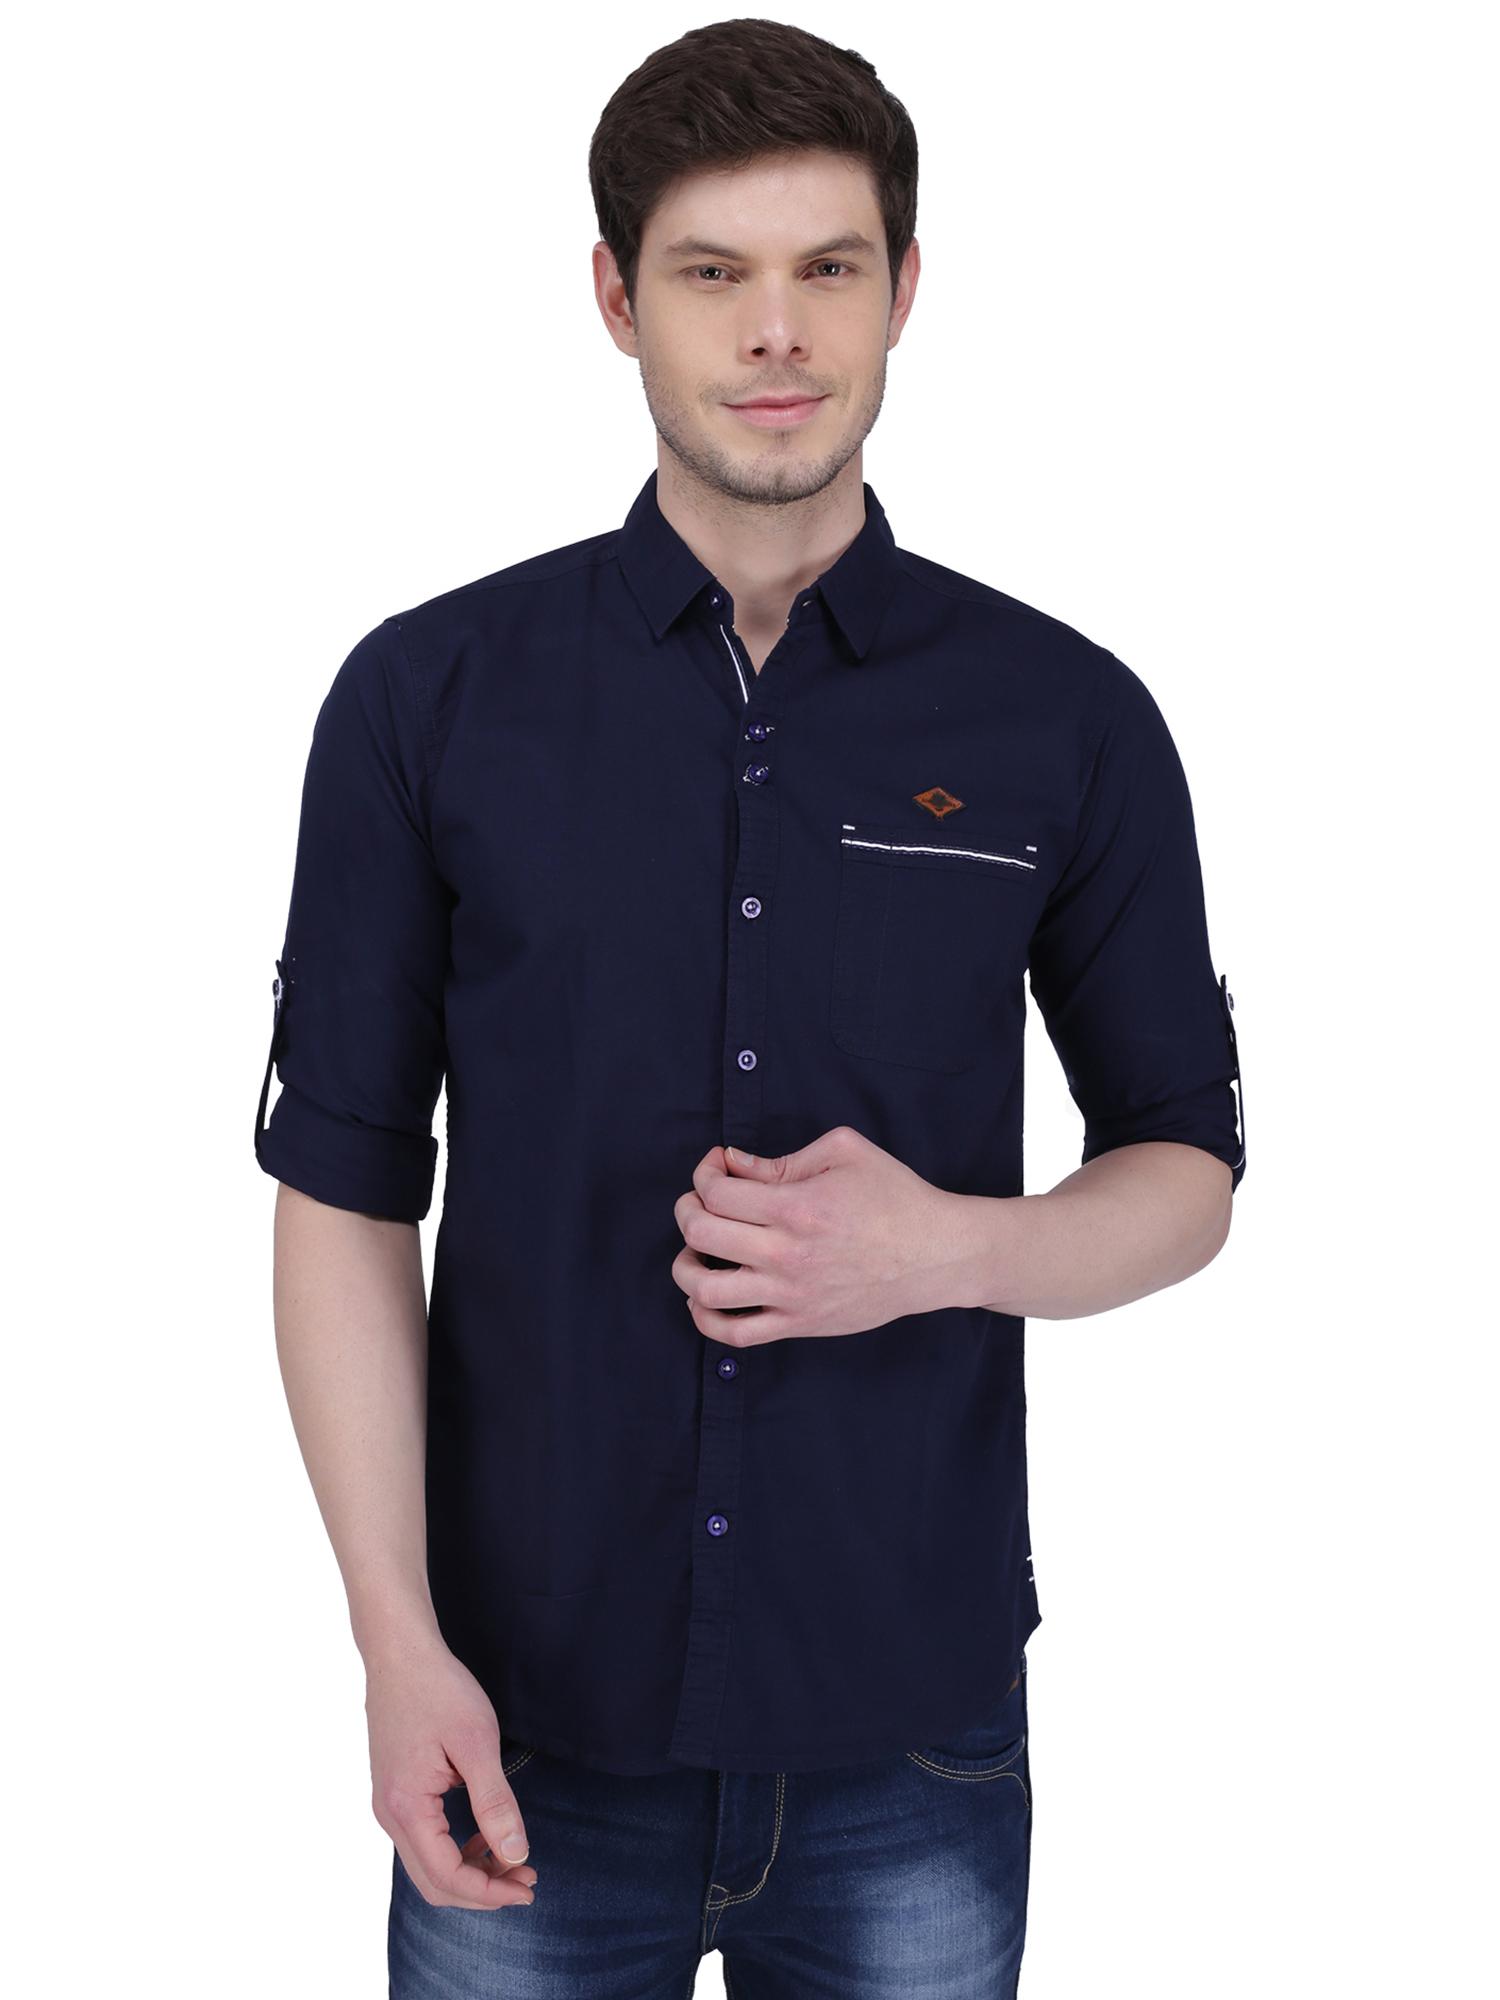 Kuons Avenue | Kuons Avenue Men's Indigo Linen Cotton Shirt- KACLFS1306IG